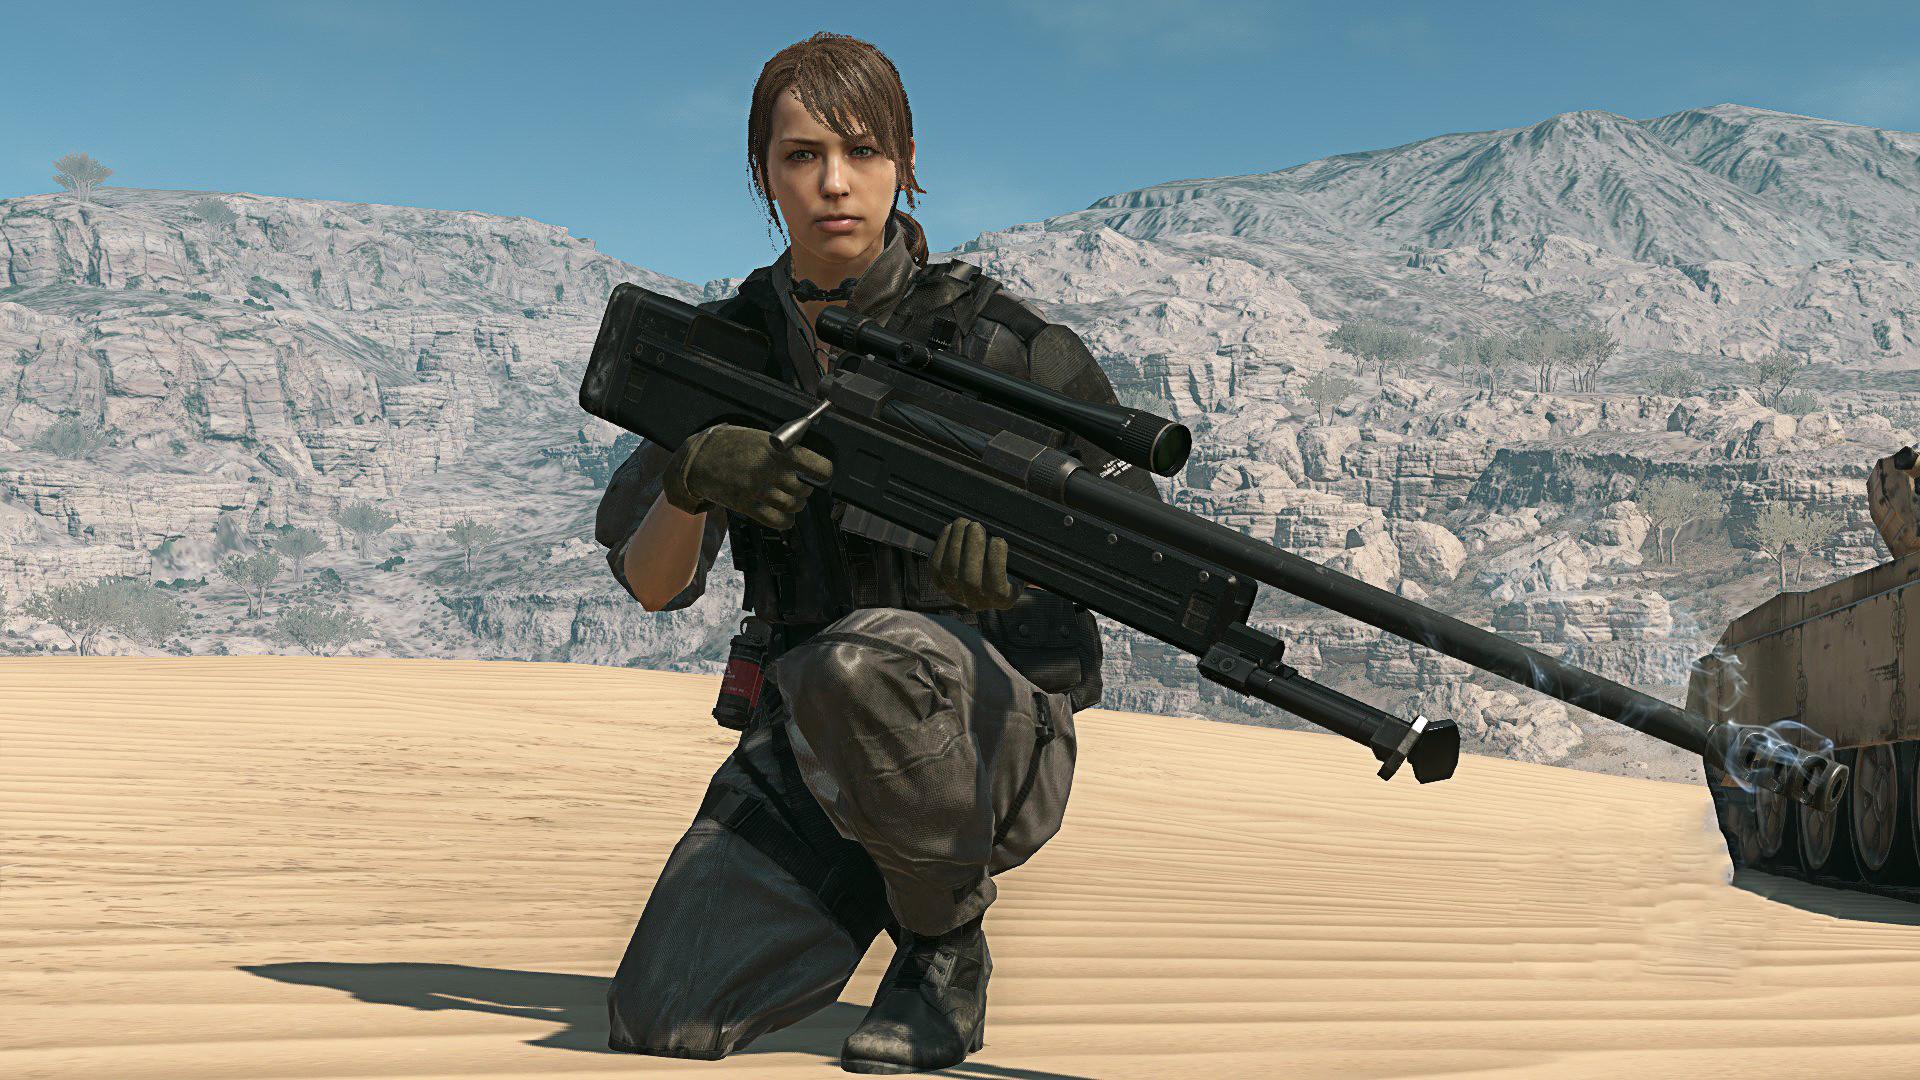 Quiet – Combat Gear – Metal Gear Solid V by BillyM12345 on DeviantArt